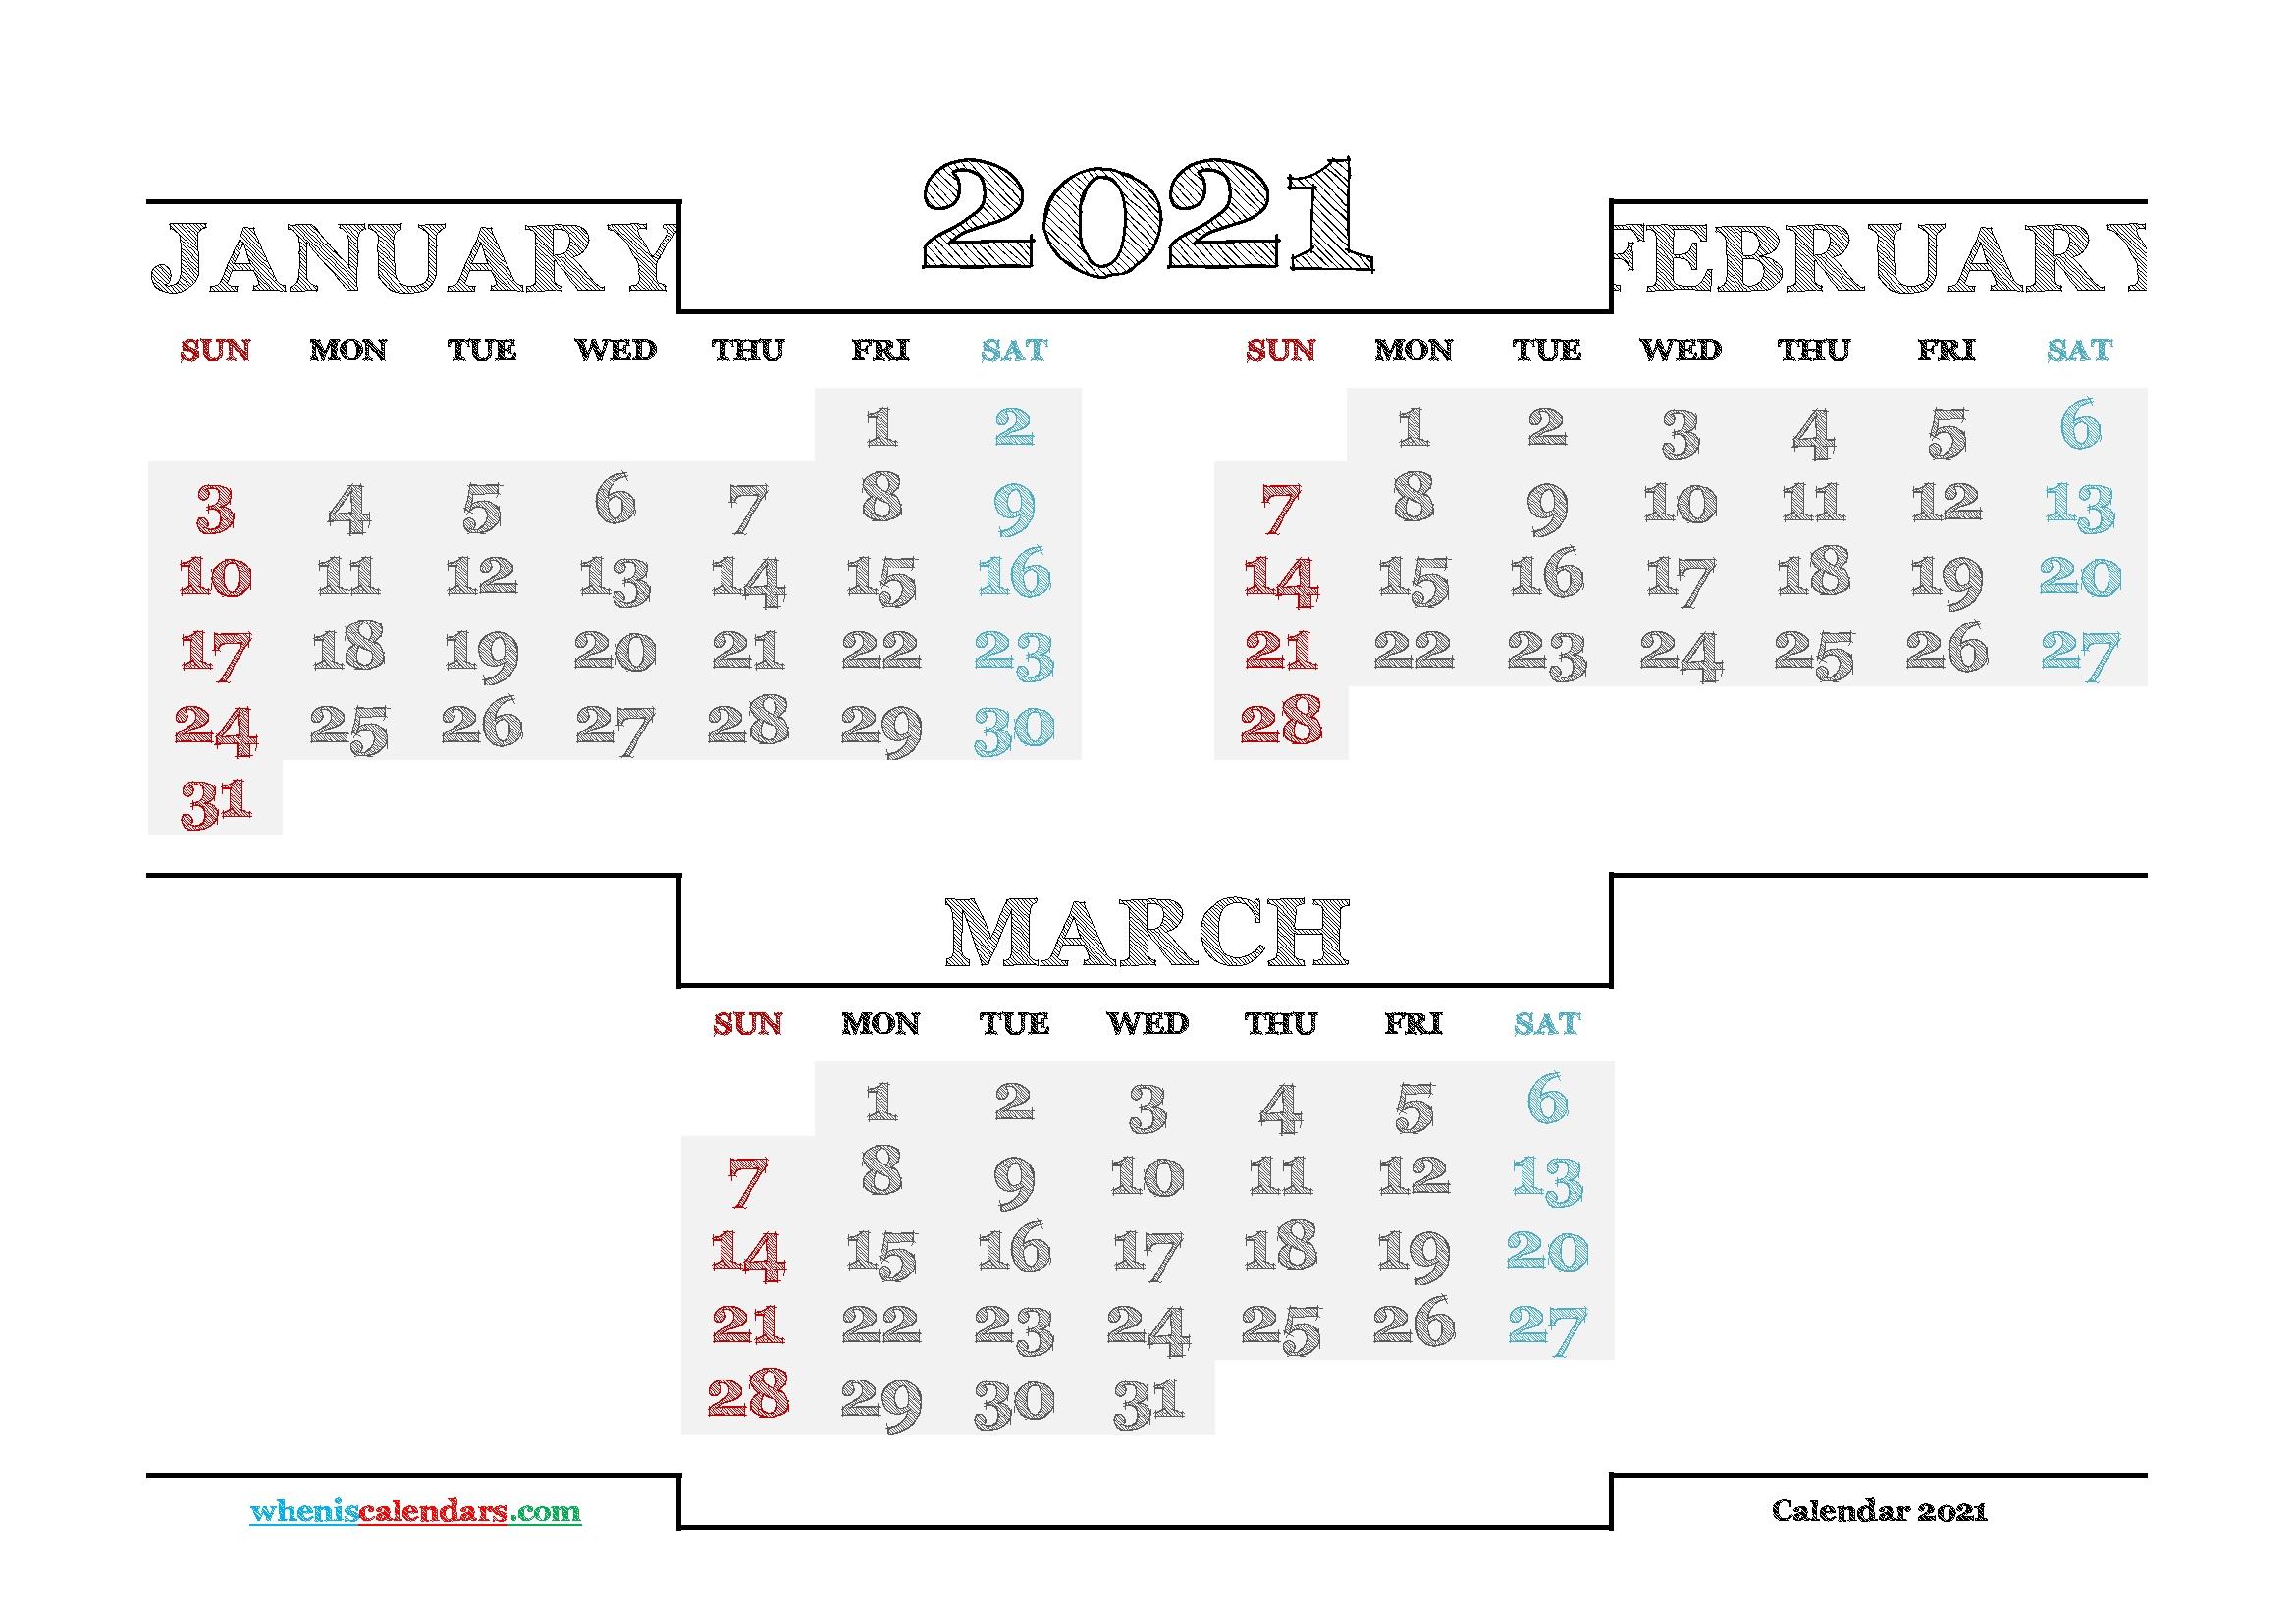 Printable Calendars For 2021 20211 2022 2023 2024 | Month inside January February March 2021 Calendar